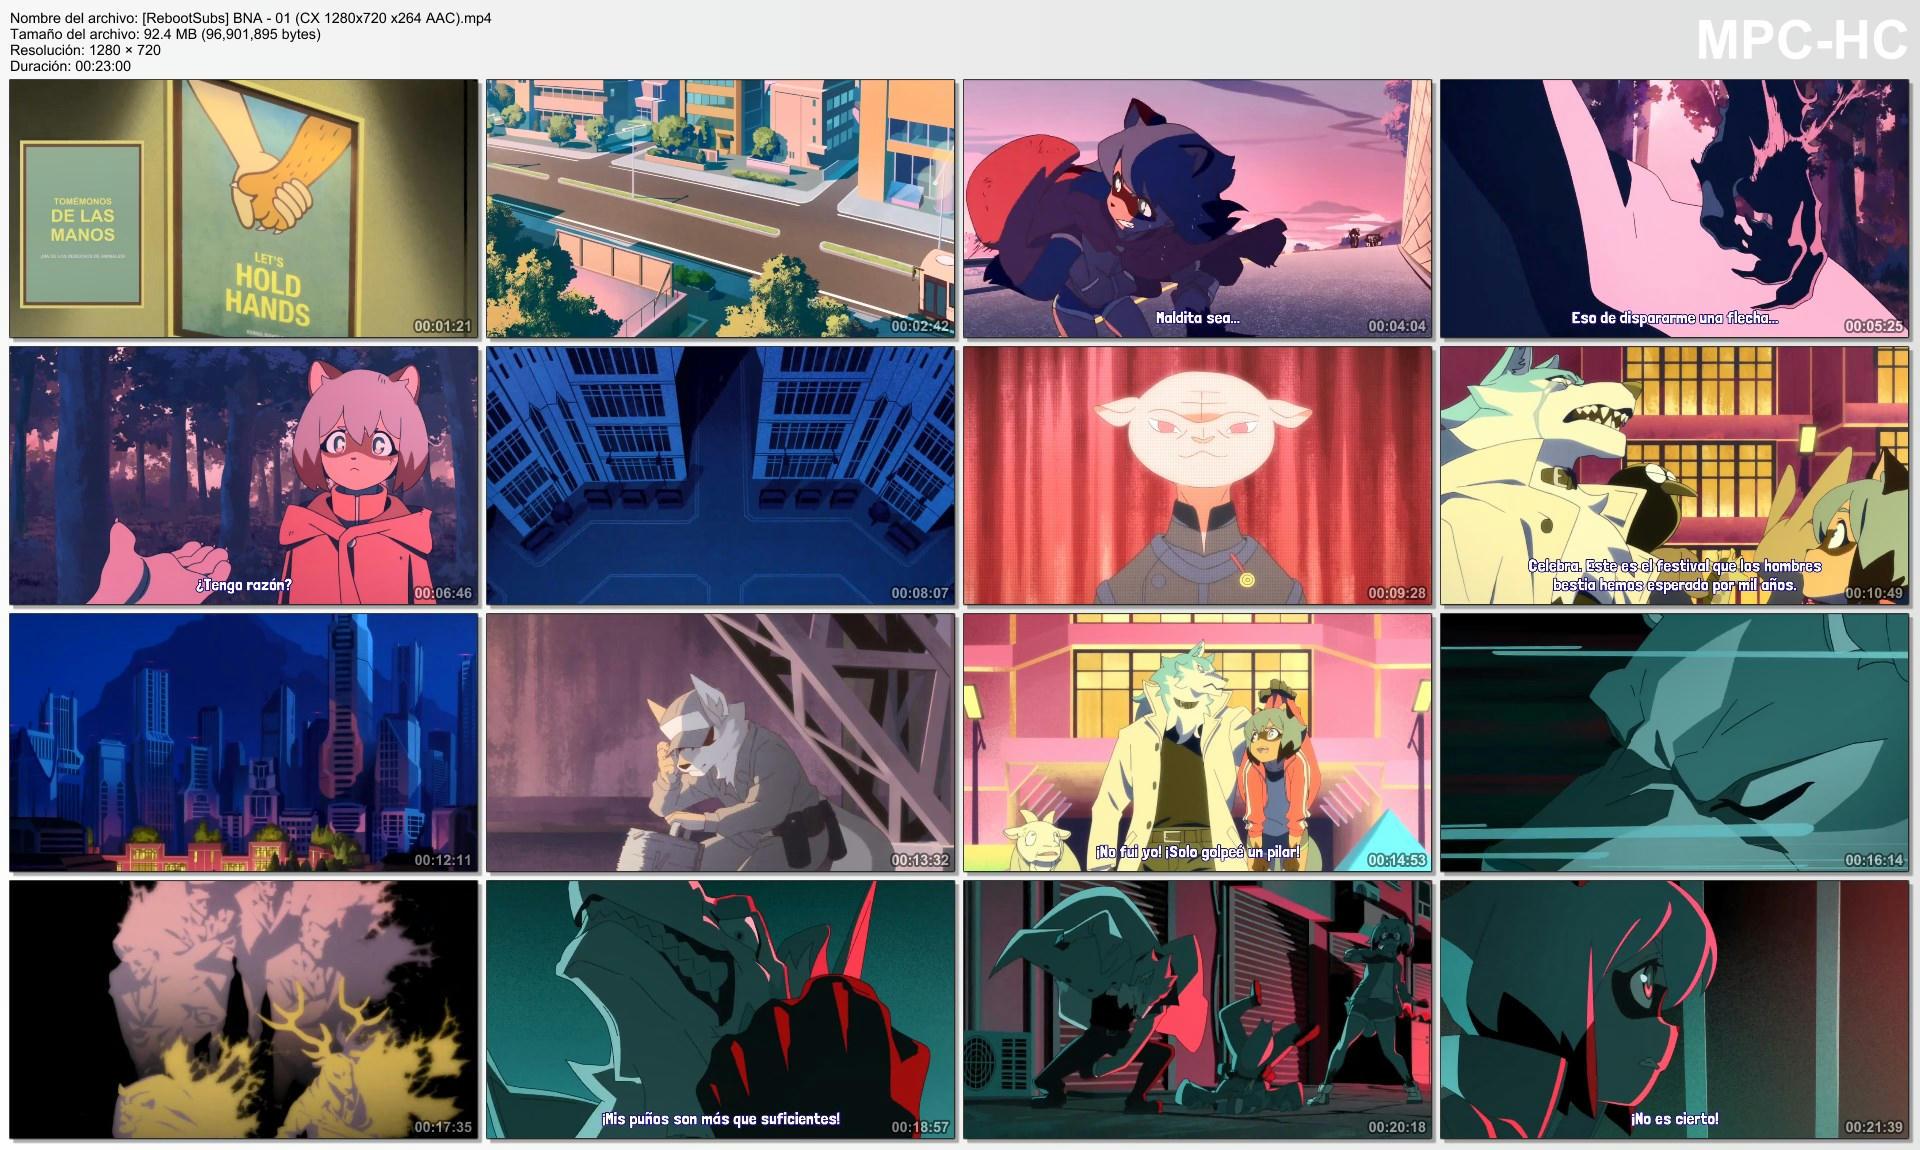 xfx468ijuxo5151zg - BNA (TV) [12/12 (Sub/Dob)] (Ligero) (Finalizado) [RebootSubs/BulletNOX] - Anime Ligero [Descargas]